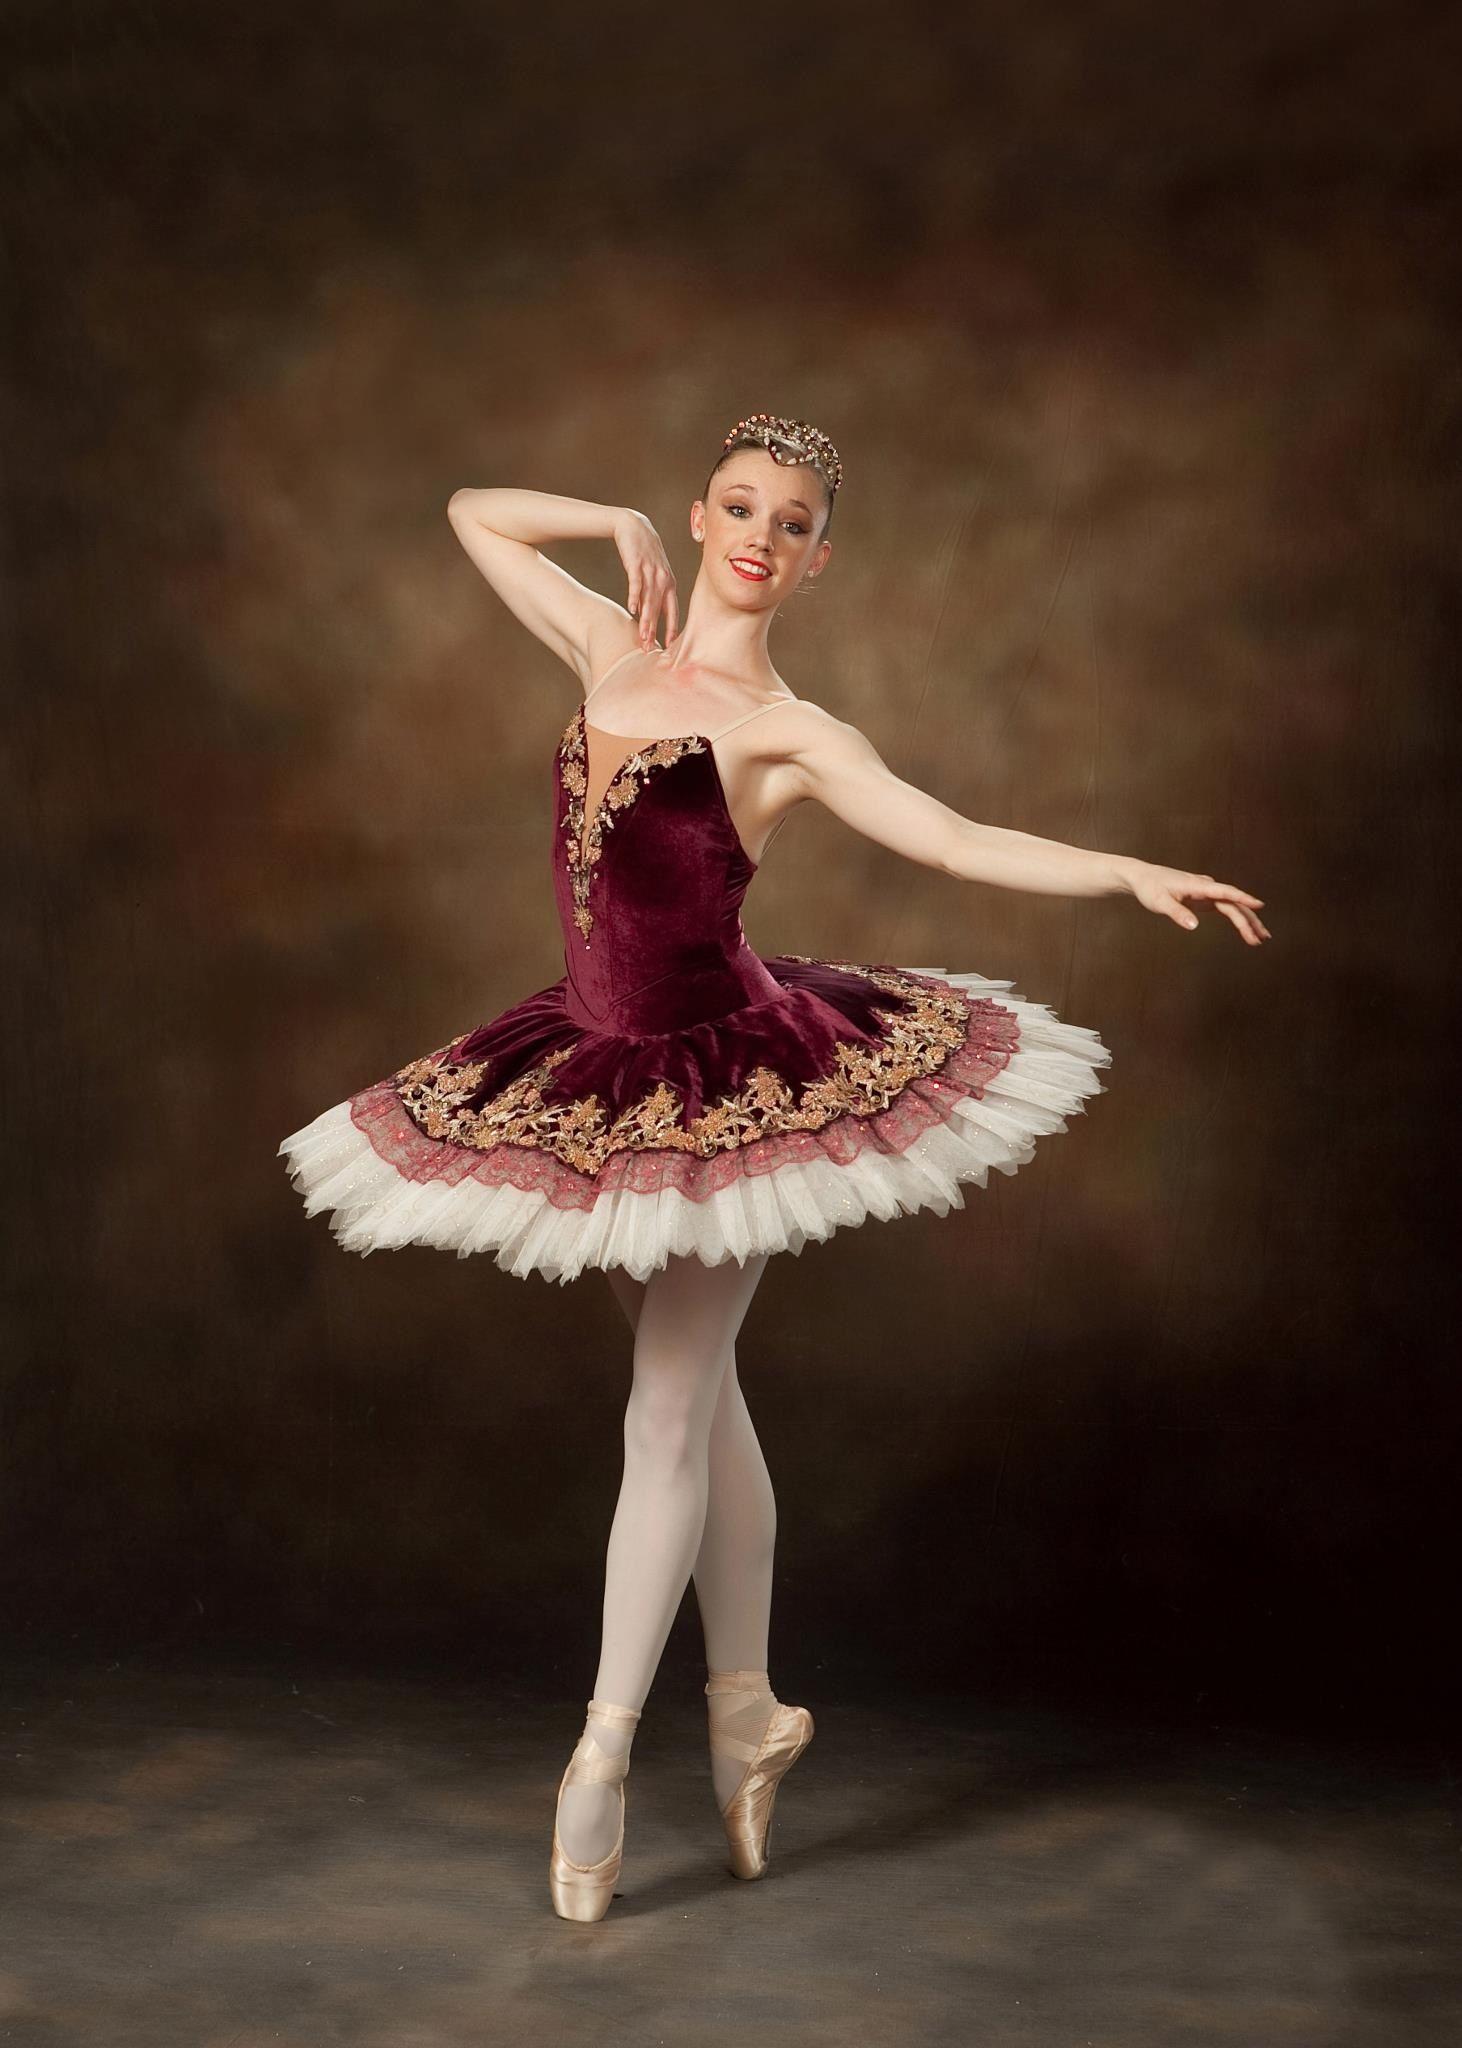 Ballerina Yevgenia Obraztsova: career, repertoire, personal life 18